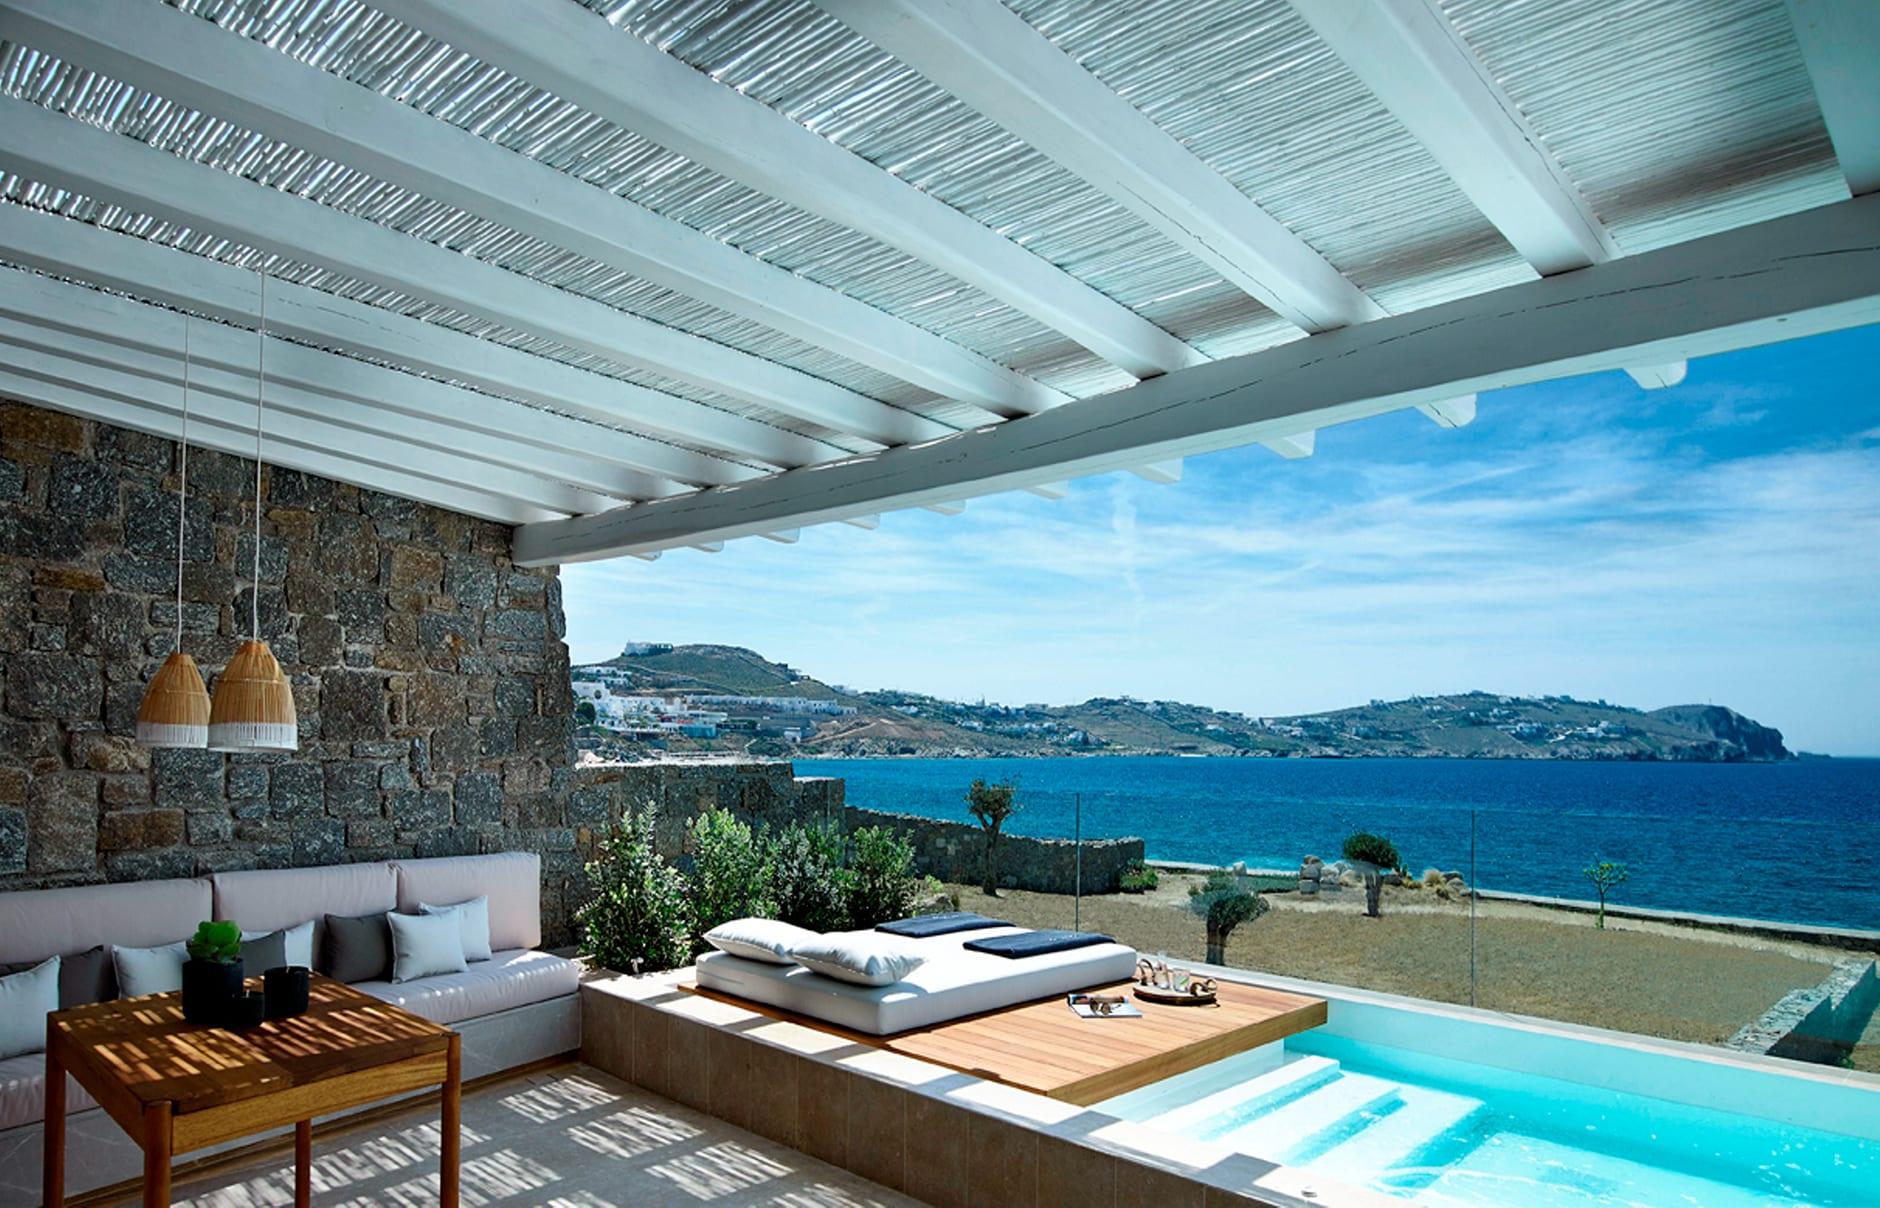 Honeymoon Coast Suite. Bill & Coo Mykonos. © Bill & Coo Mykonos